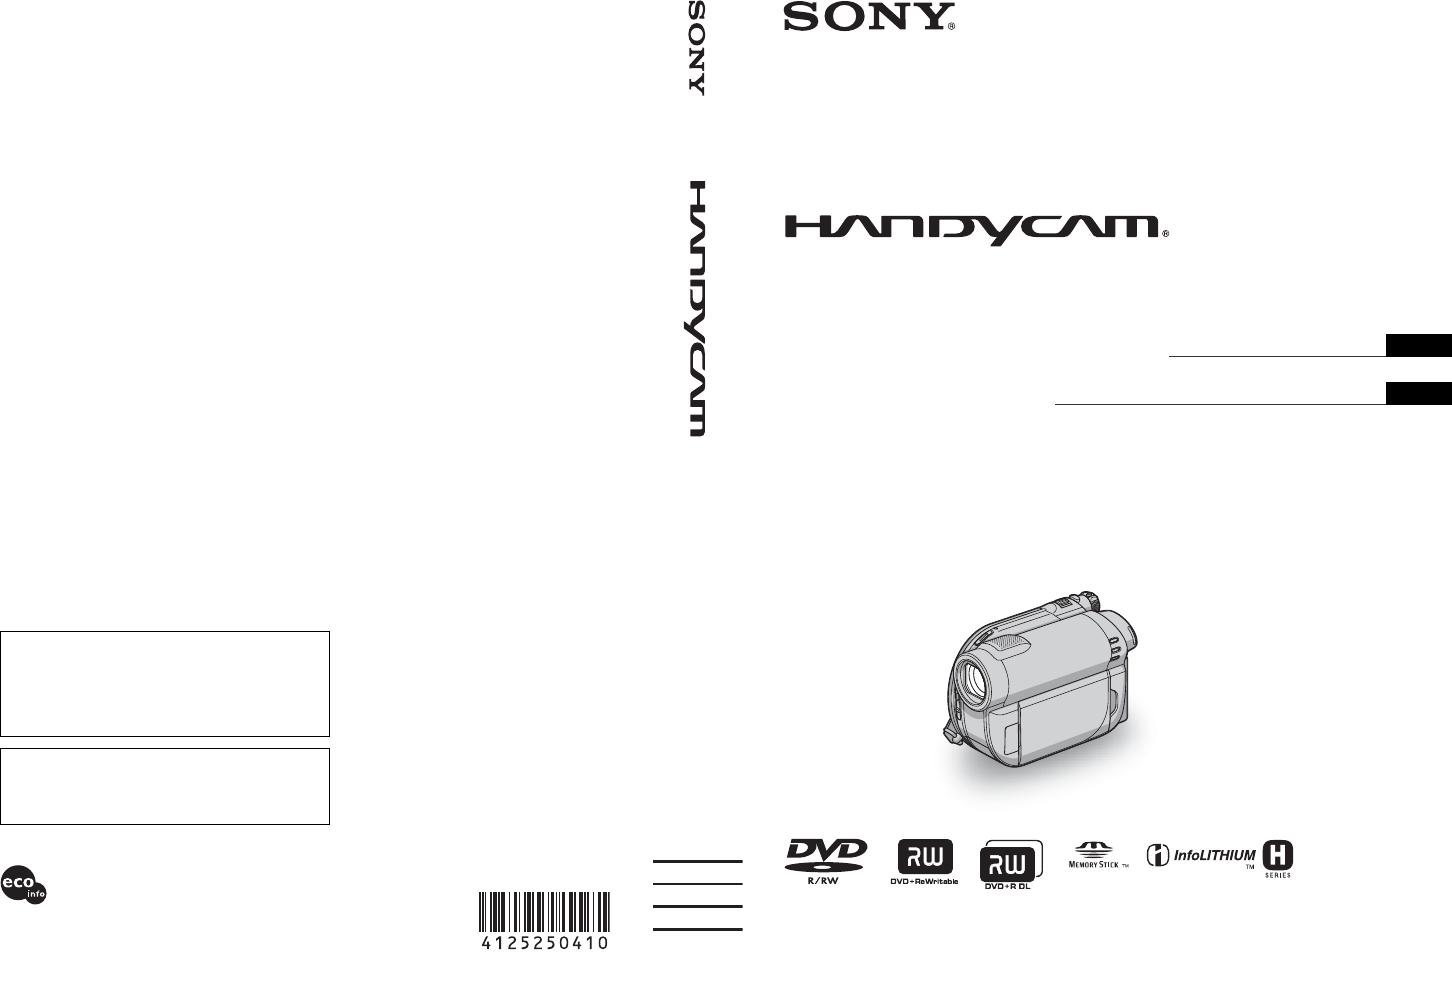 Handleiding Sony dcr dvd650 (pagina 1 van 279) (Deutsch